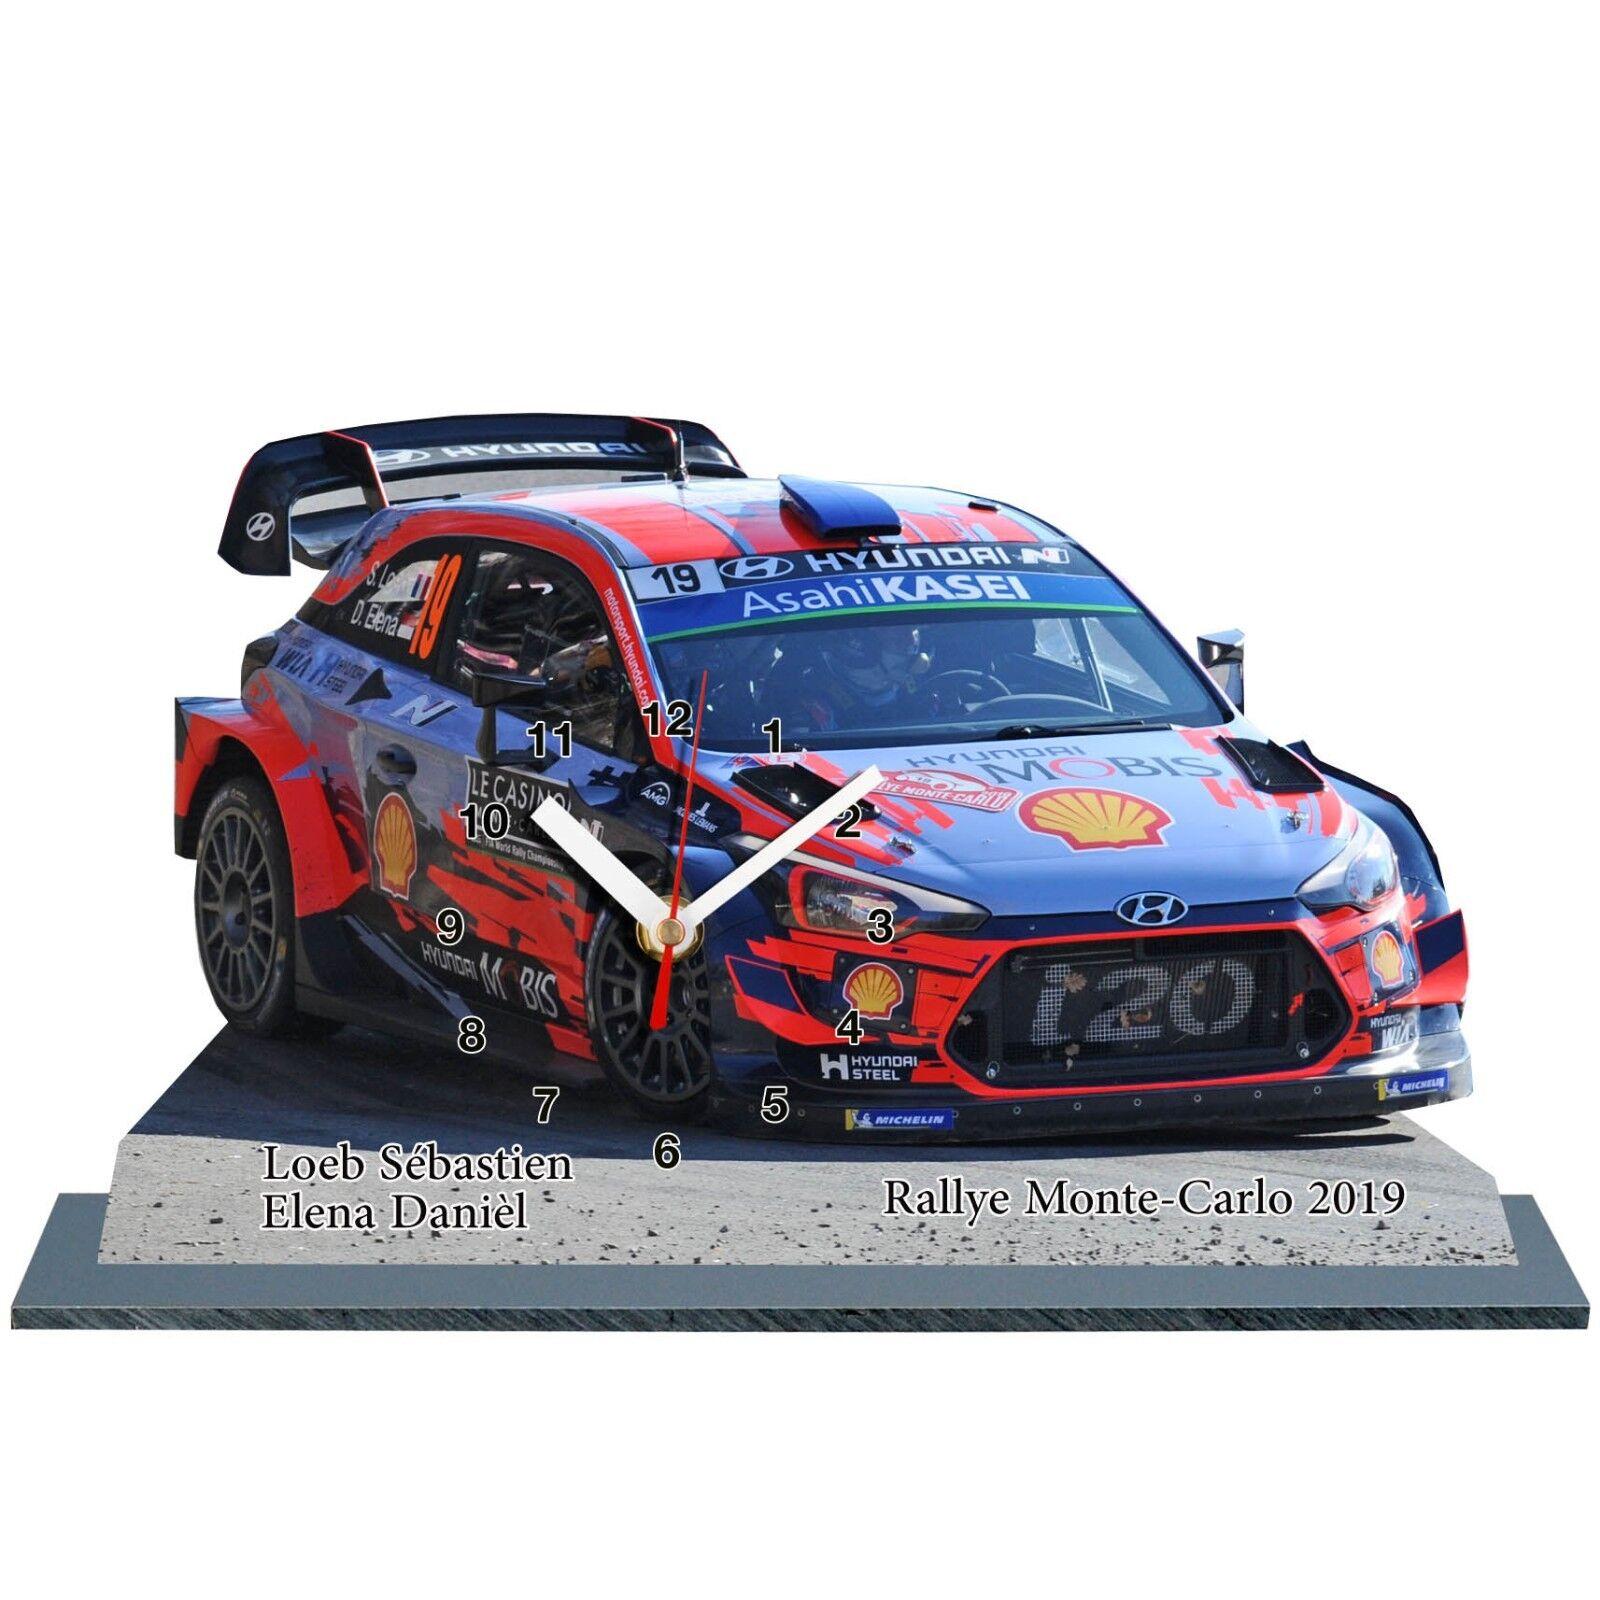 Loeb, Rally Monte Carlo 2019, Hyundai I20, Auto in goldlogio Miniatura 01